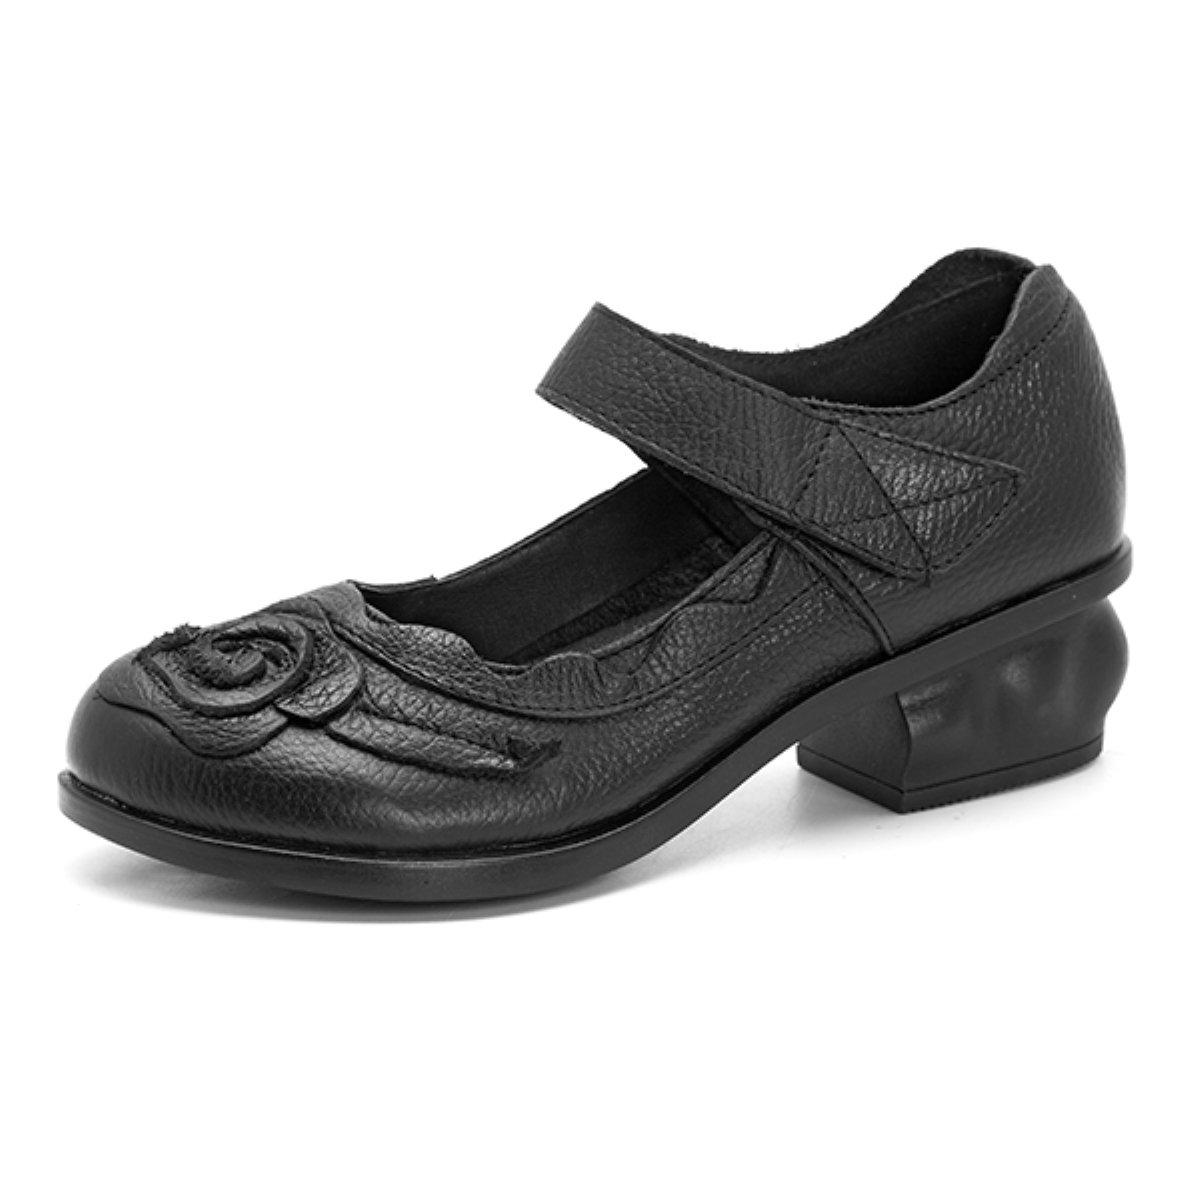 Socofy Damen Leder Slipper, Leder Mokassins Blume Loafers Flache Schuhe Vintage Flats Stiefelschuhe Casual Slip-Ons Metallic Ballerinas für Frühjahr/Sommer Schwarz-a